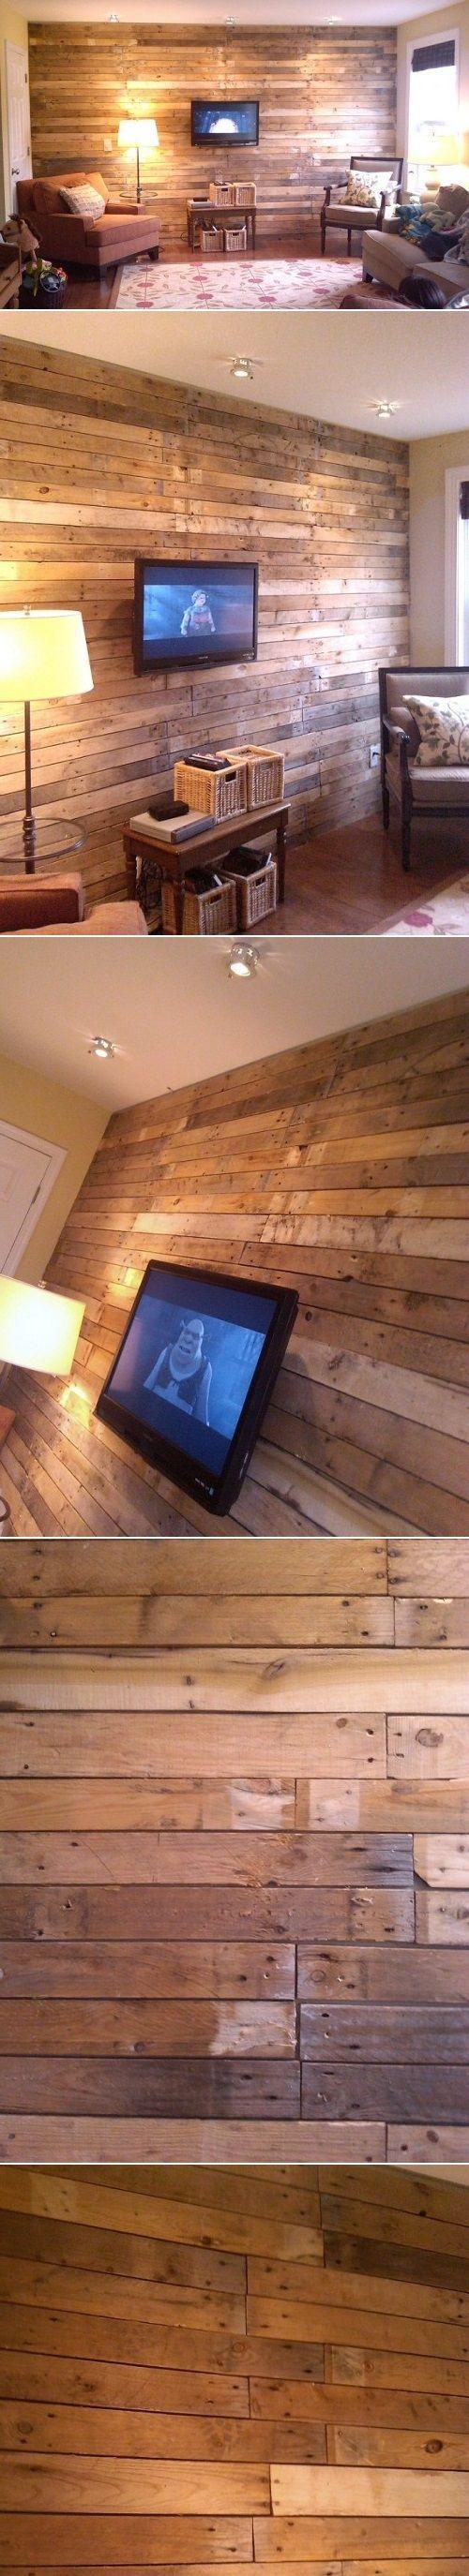 DIY Wood Pallet Wall